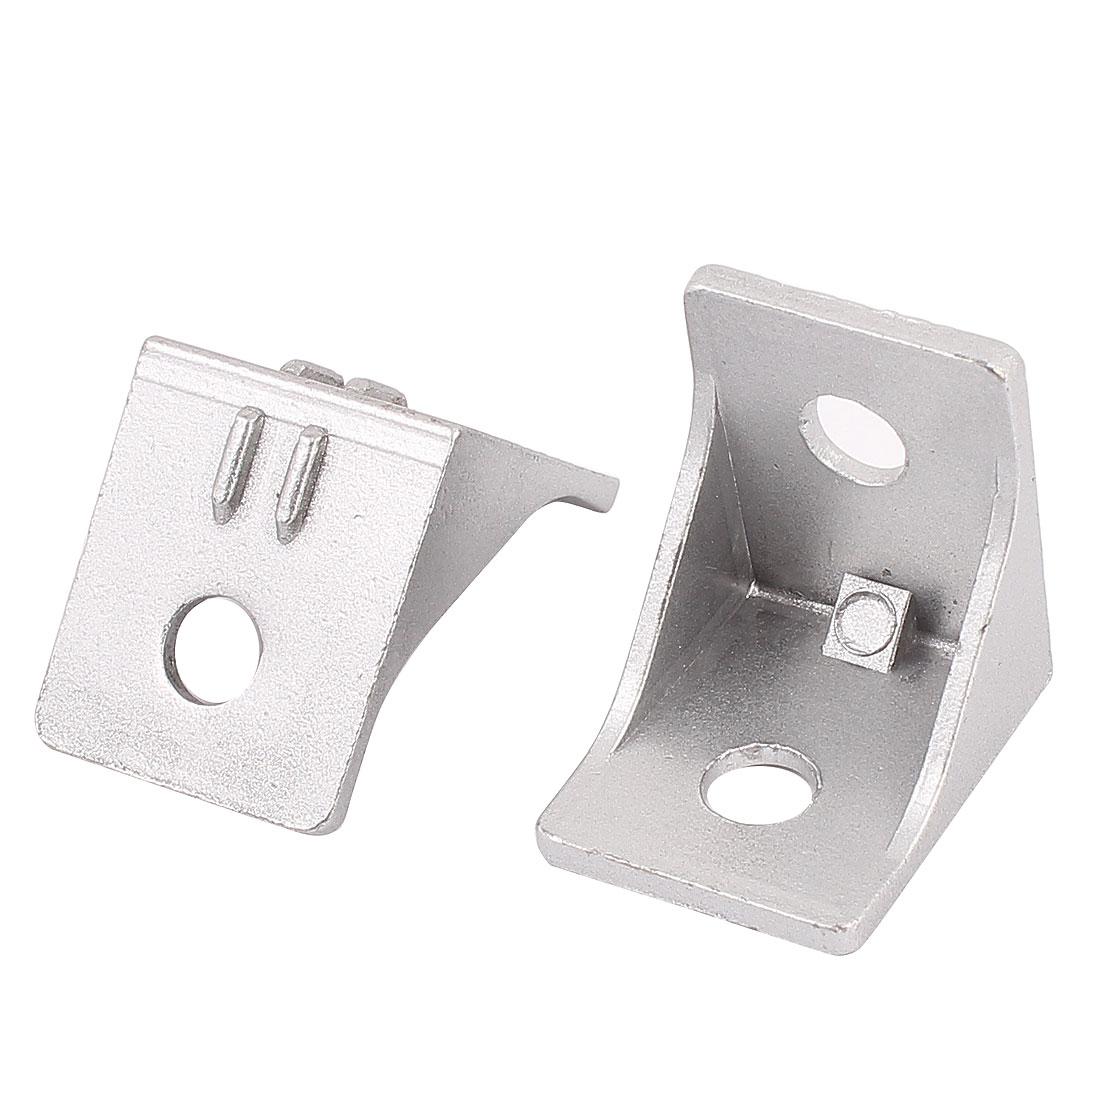 2Pcs Aluminum Alloy 33x33x28mm Corner Braces Angle Brackets Supports